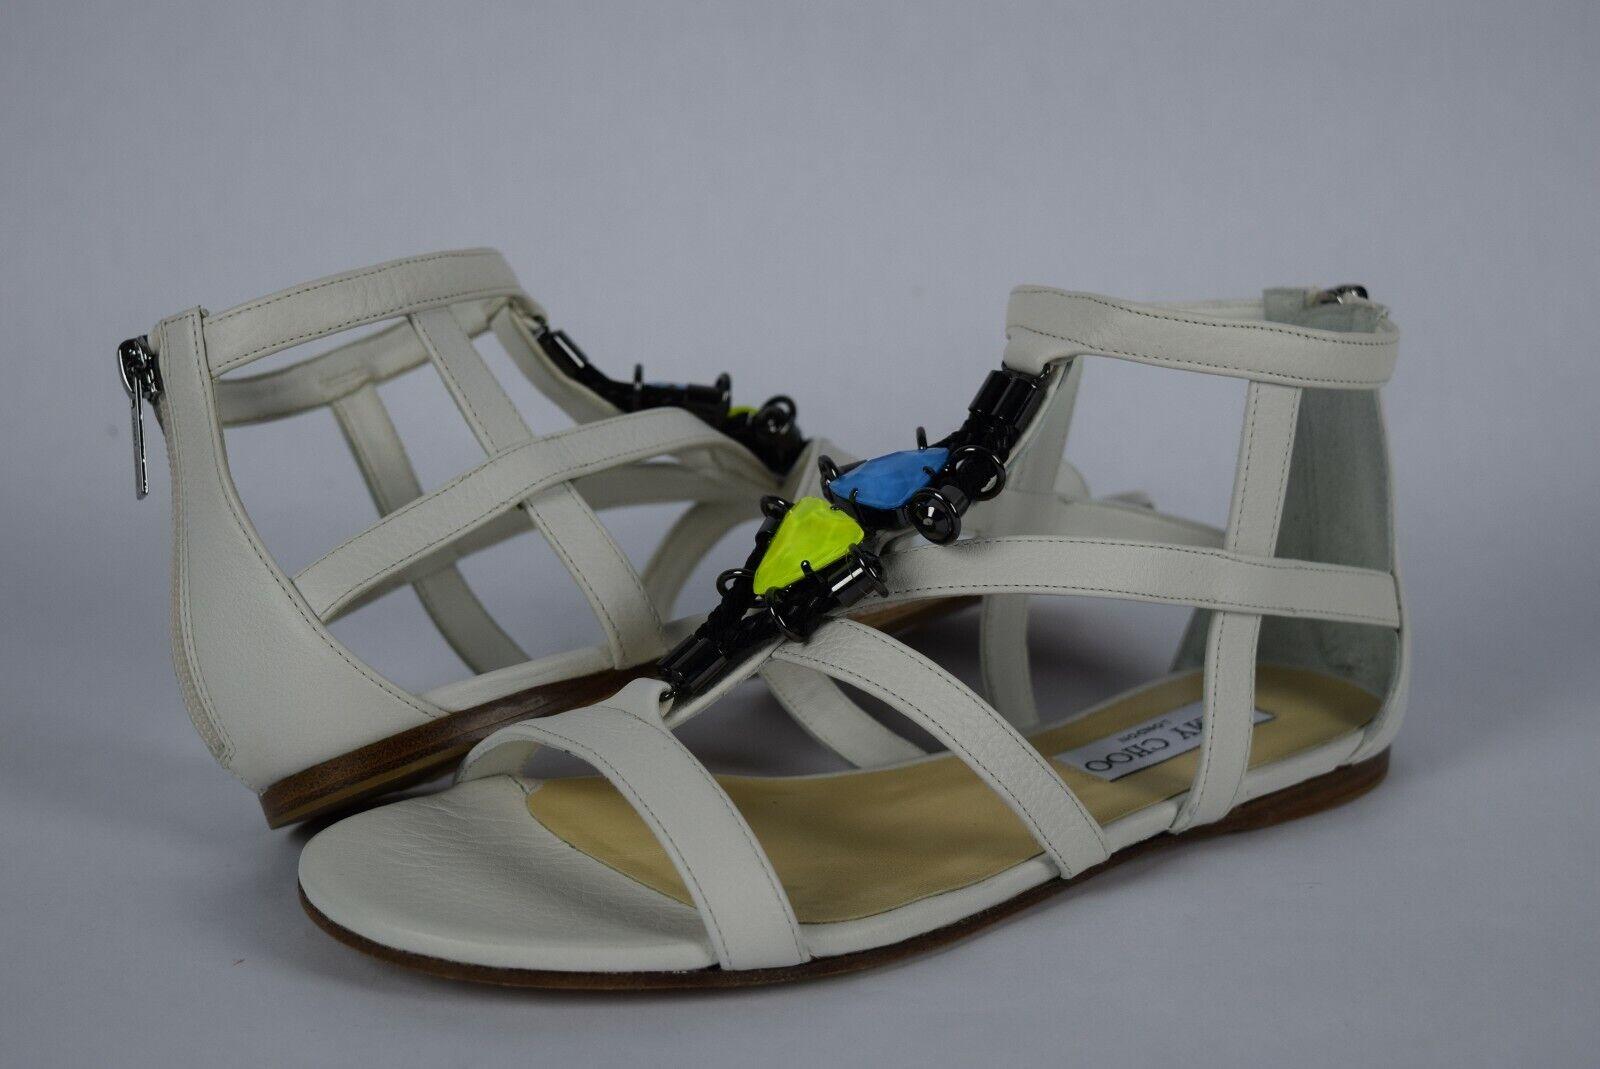 NIB  625 Jimmy Choo Nano Flat MJP Optic vit Gladiator Sandals sz 36.5 Juveler